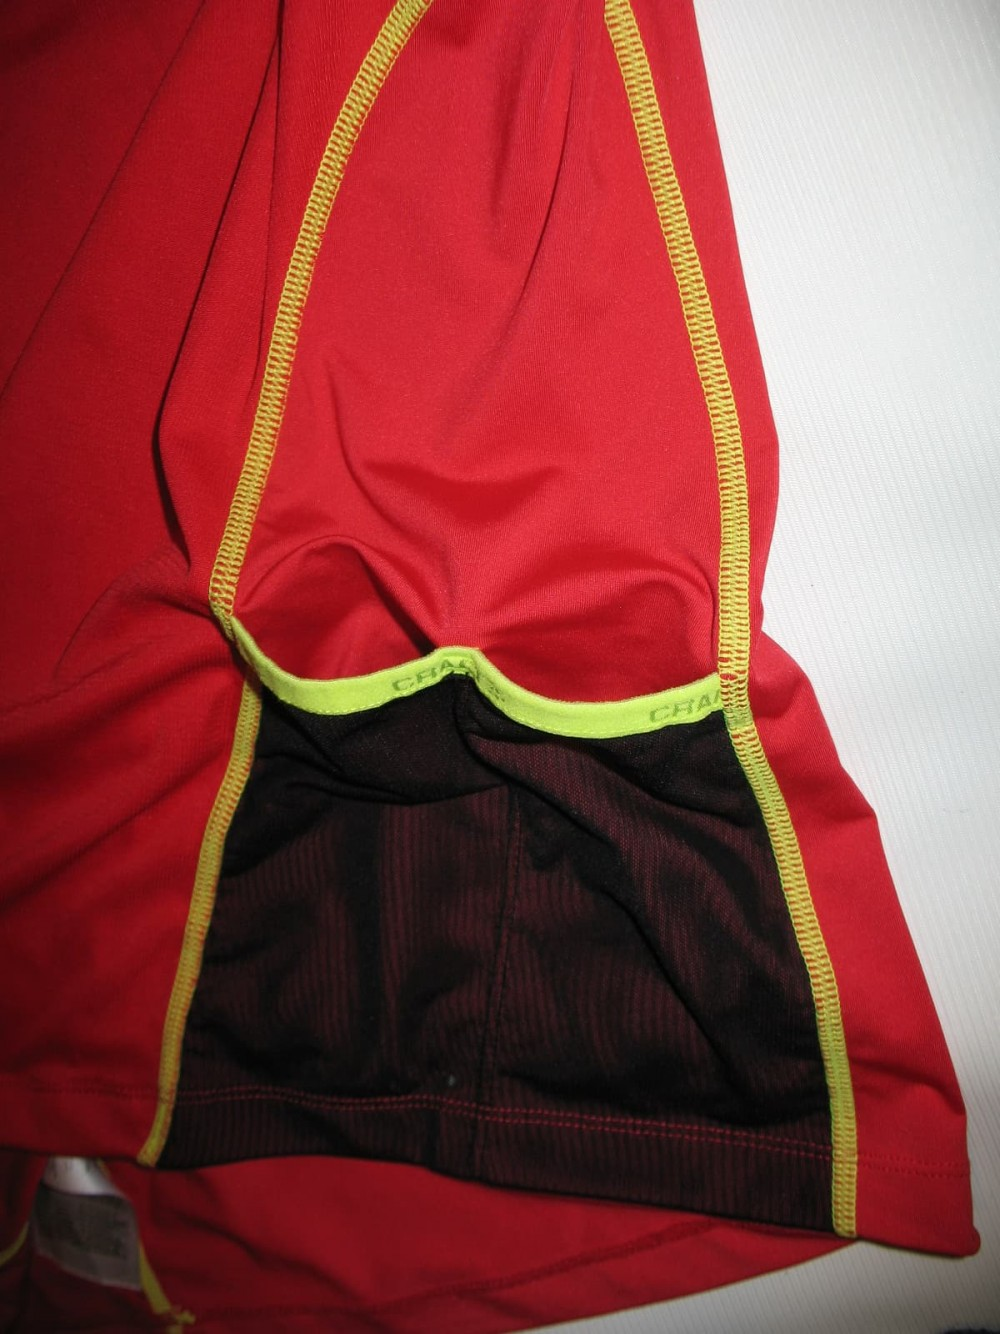 Майка CRAFT trail ss top jersey (размер S(реально M)) - 5